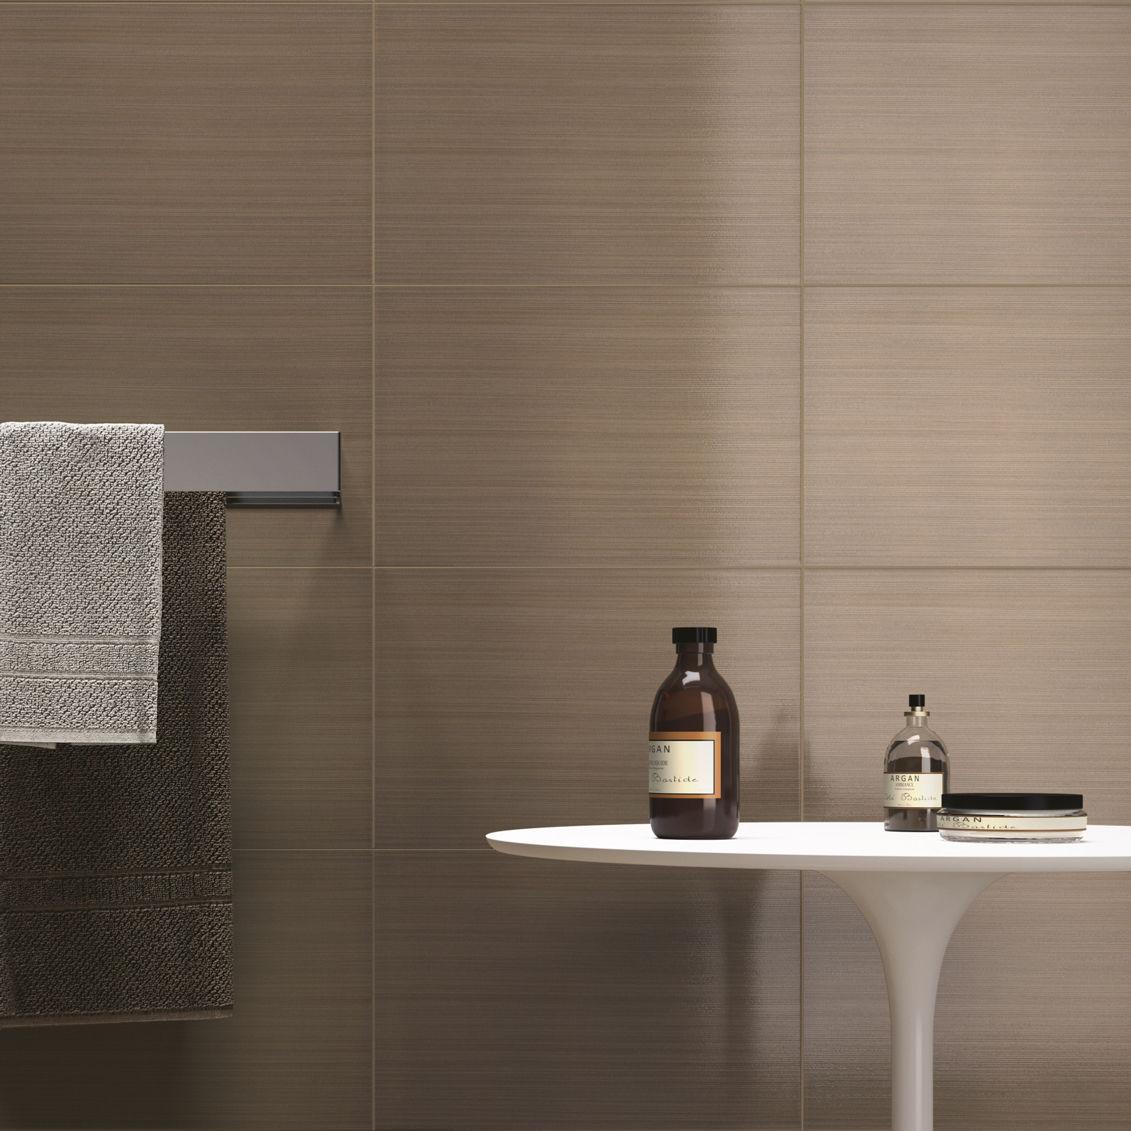 Bathroom Tile Wall Ceramic Rectangular Line Ragno